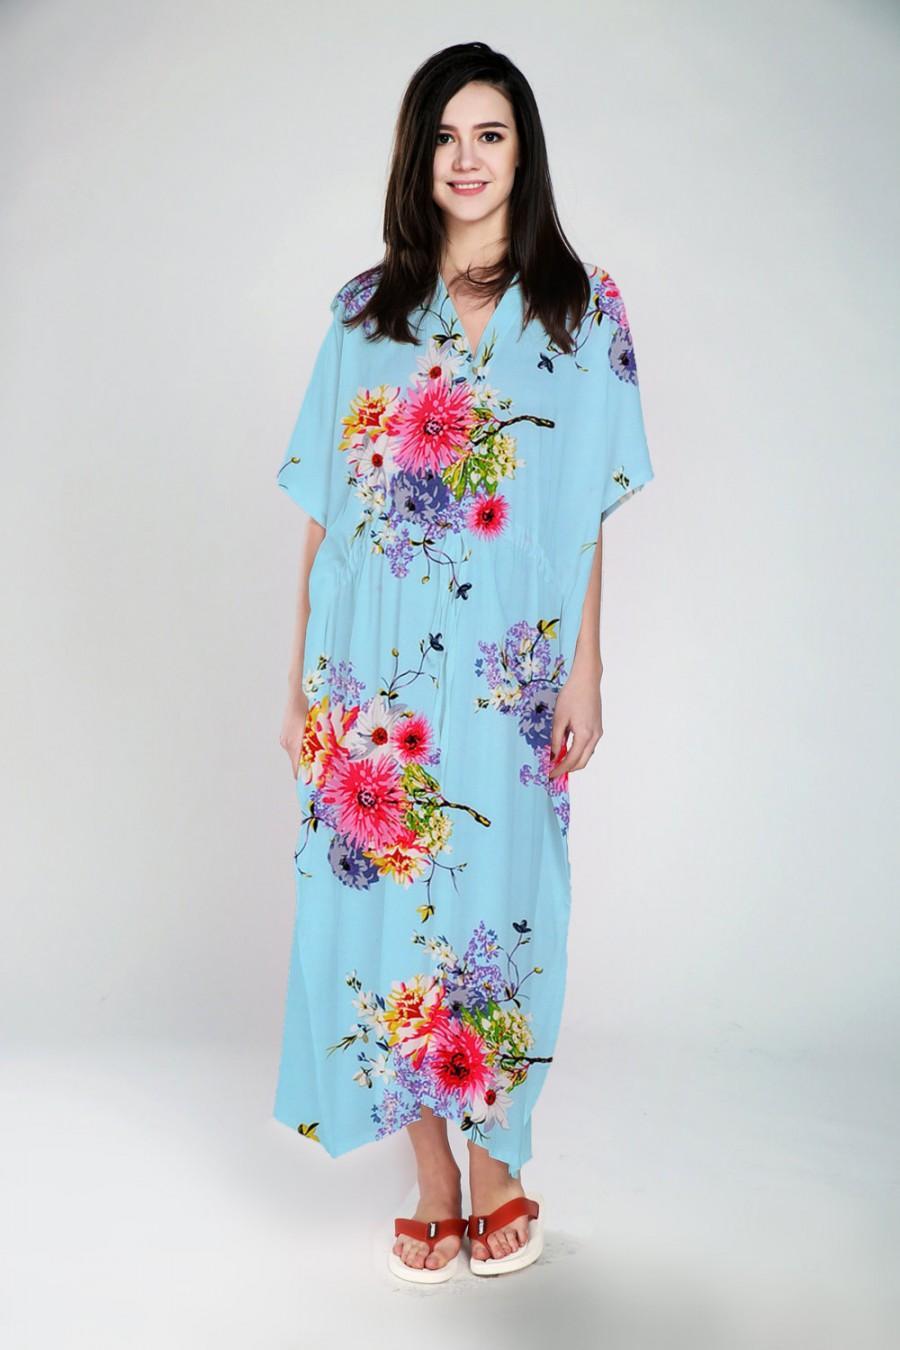 Designer Maternity Hospital Gowns Nursing Hospital Summer Maternity